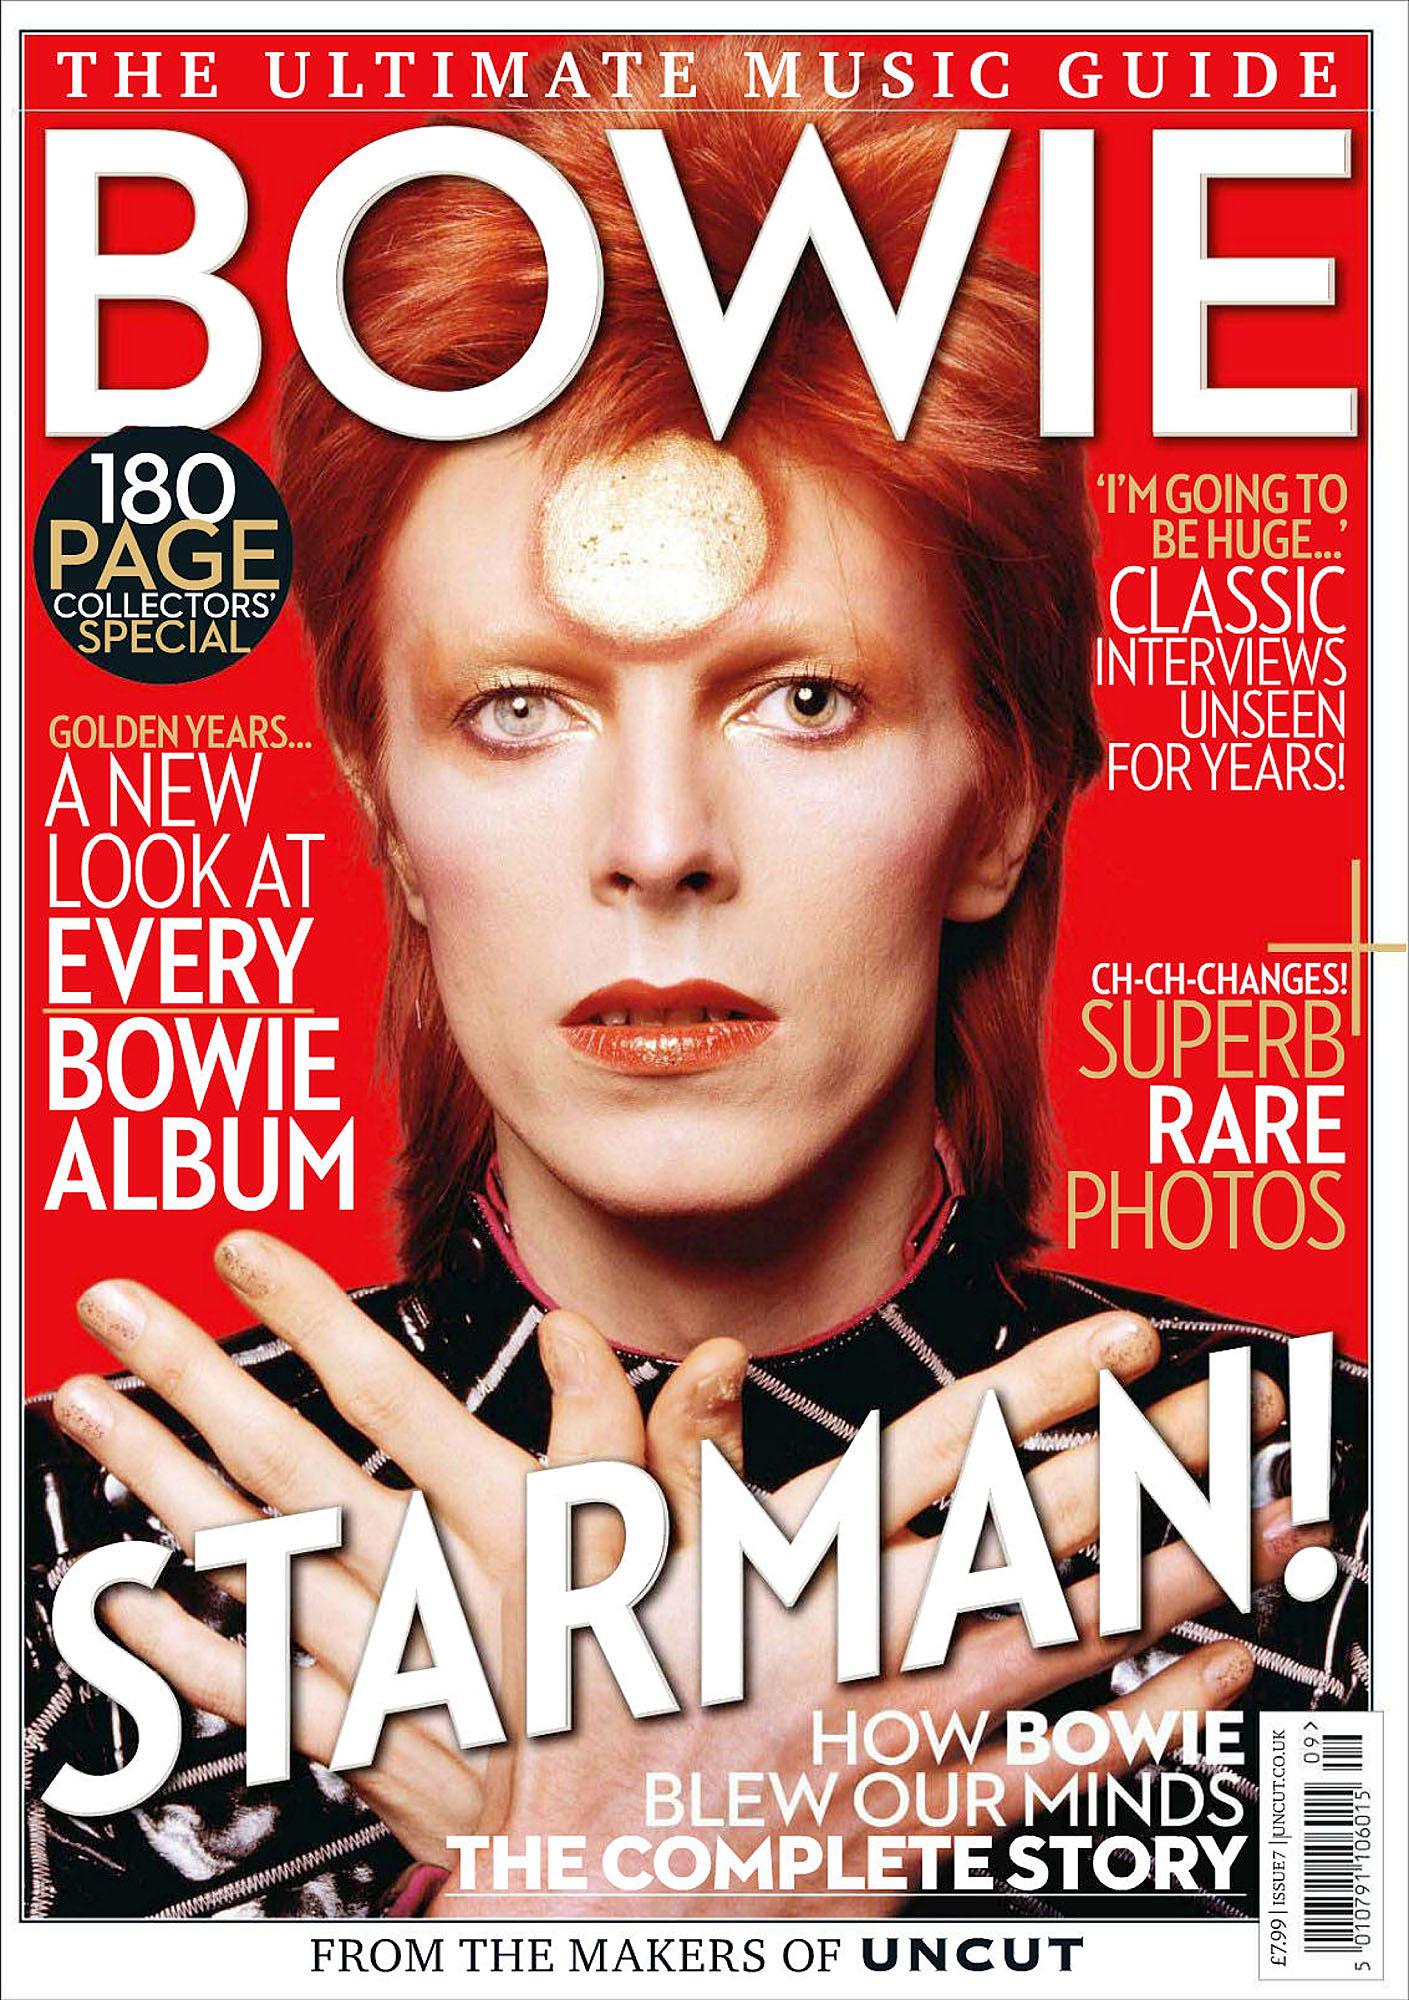 David Bowie - Uncut Ultimate Music Guide.jpg